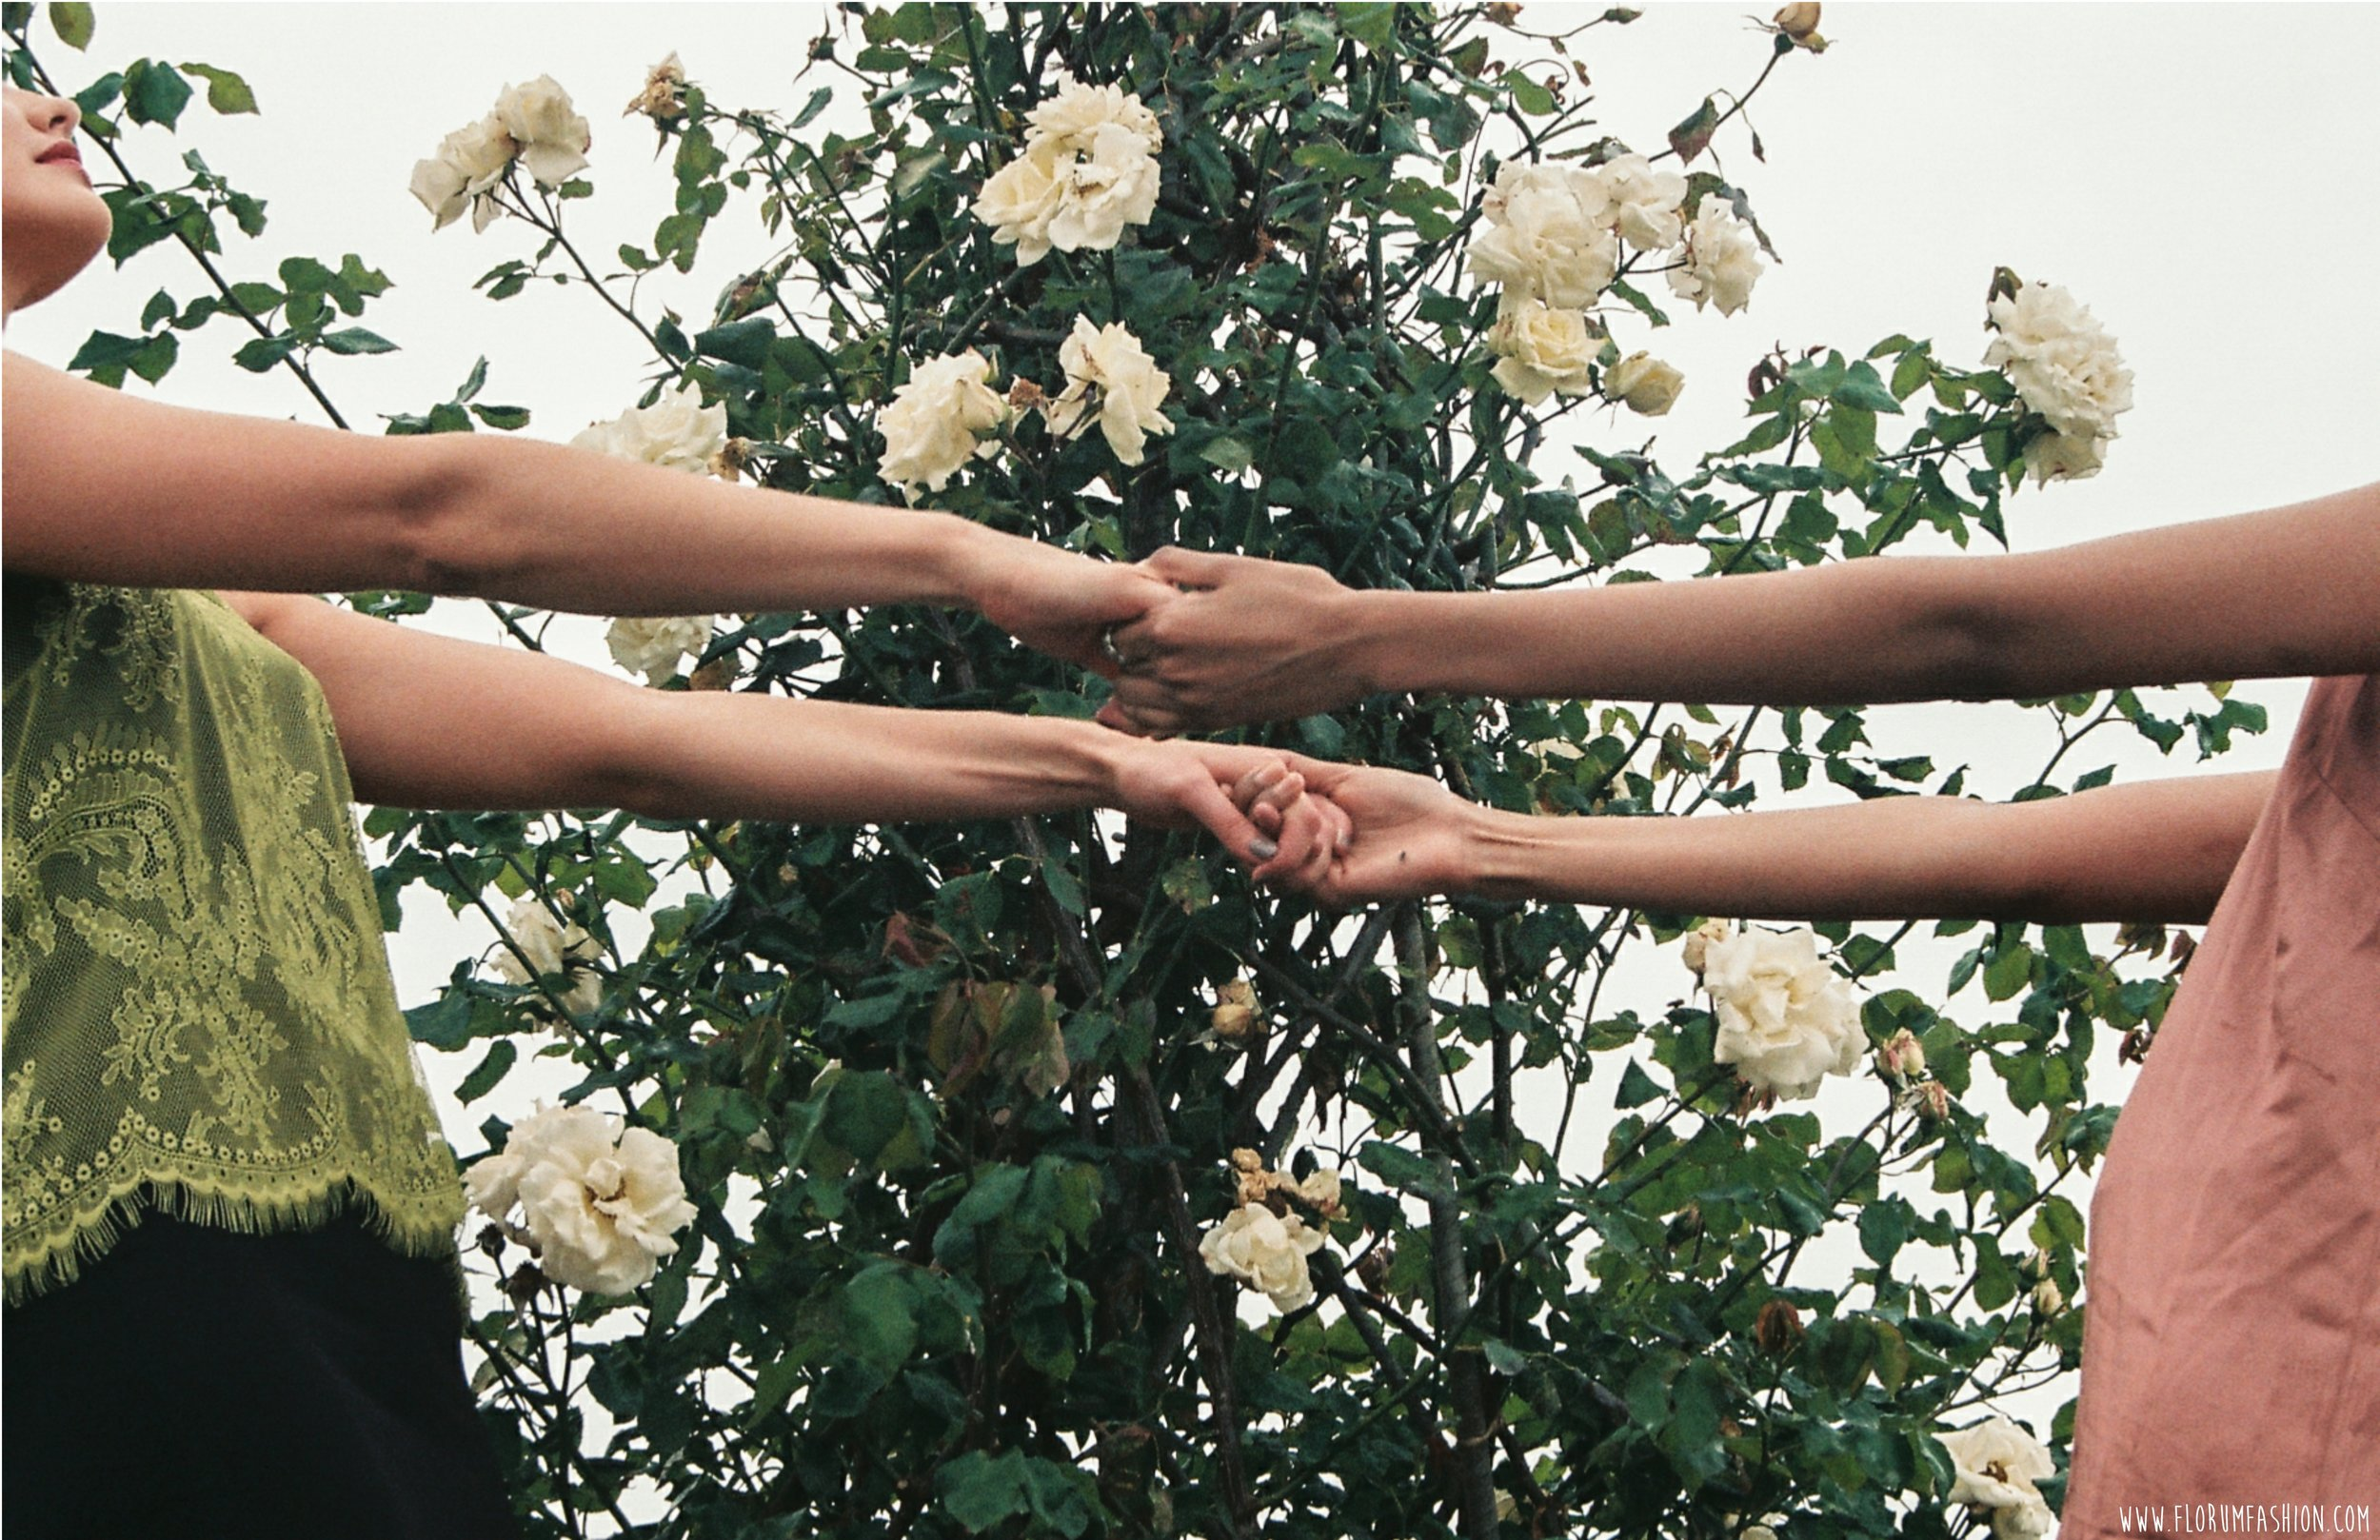 In Bloom - Florum Fashion Magazine - Kamilla Musland - Brooke Portogallo - Melissa Rushidi - Analyce Thomas - Jr Management